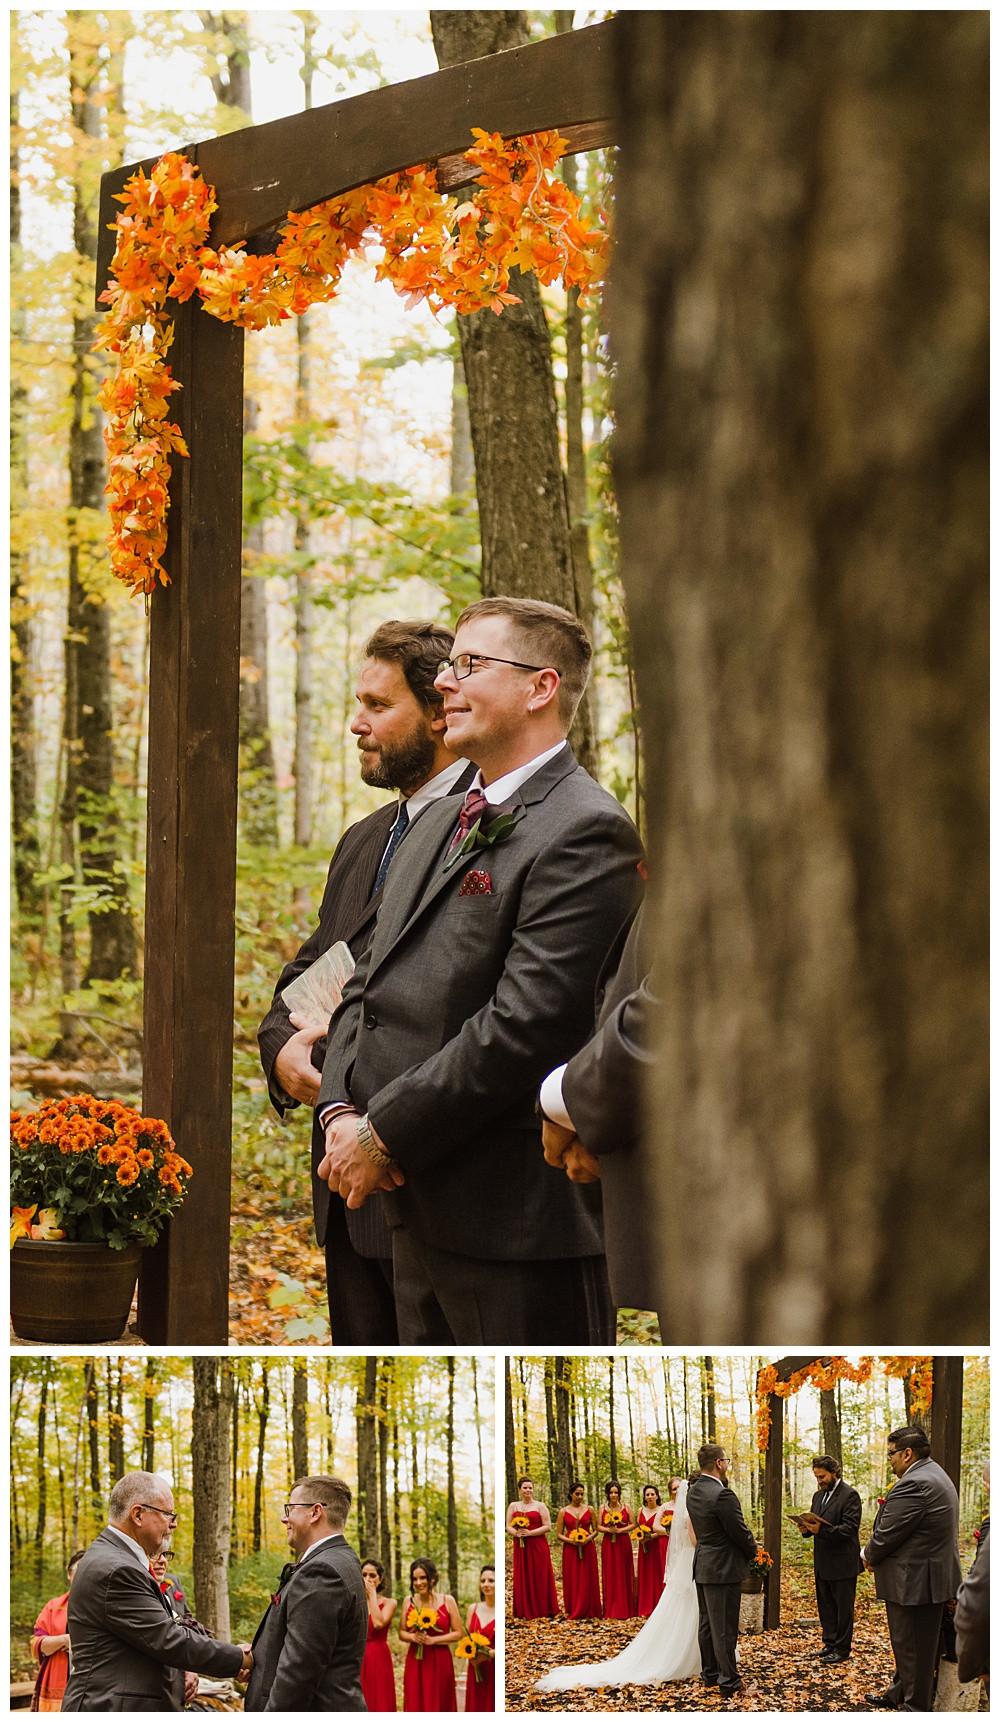 Groom Waiting for Bride, Temples Sugar Bush, Ottawa Wedding Photographer, Ottawa Boudoir Photographer